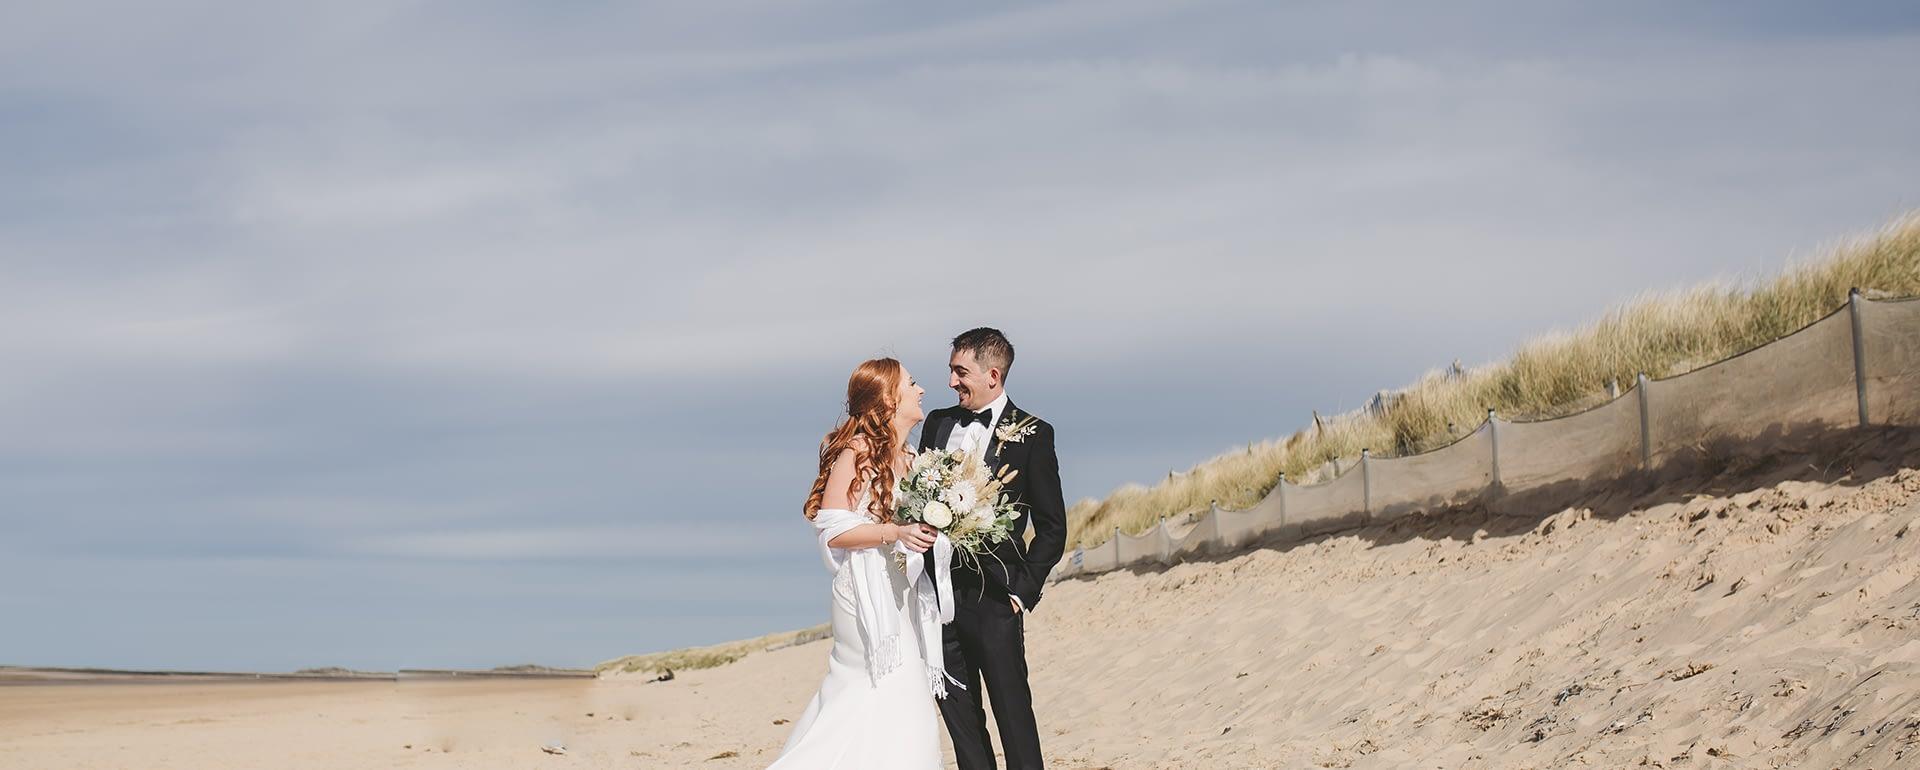 Coastal Wedding Showcase at Titchwell Manor